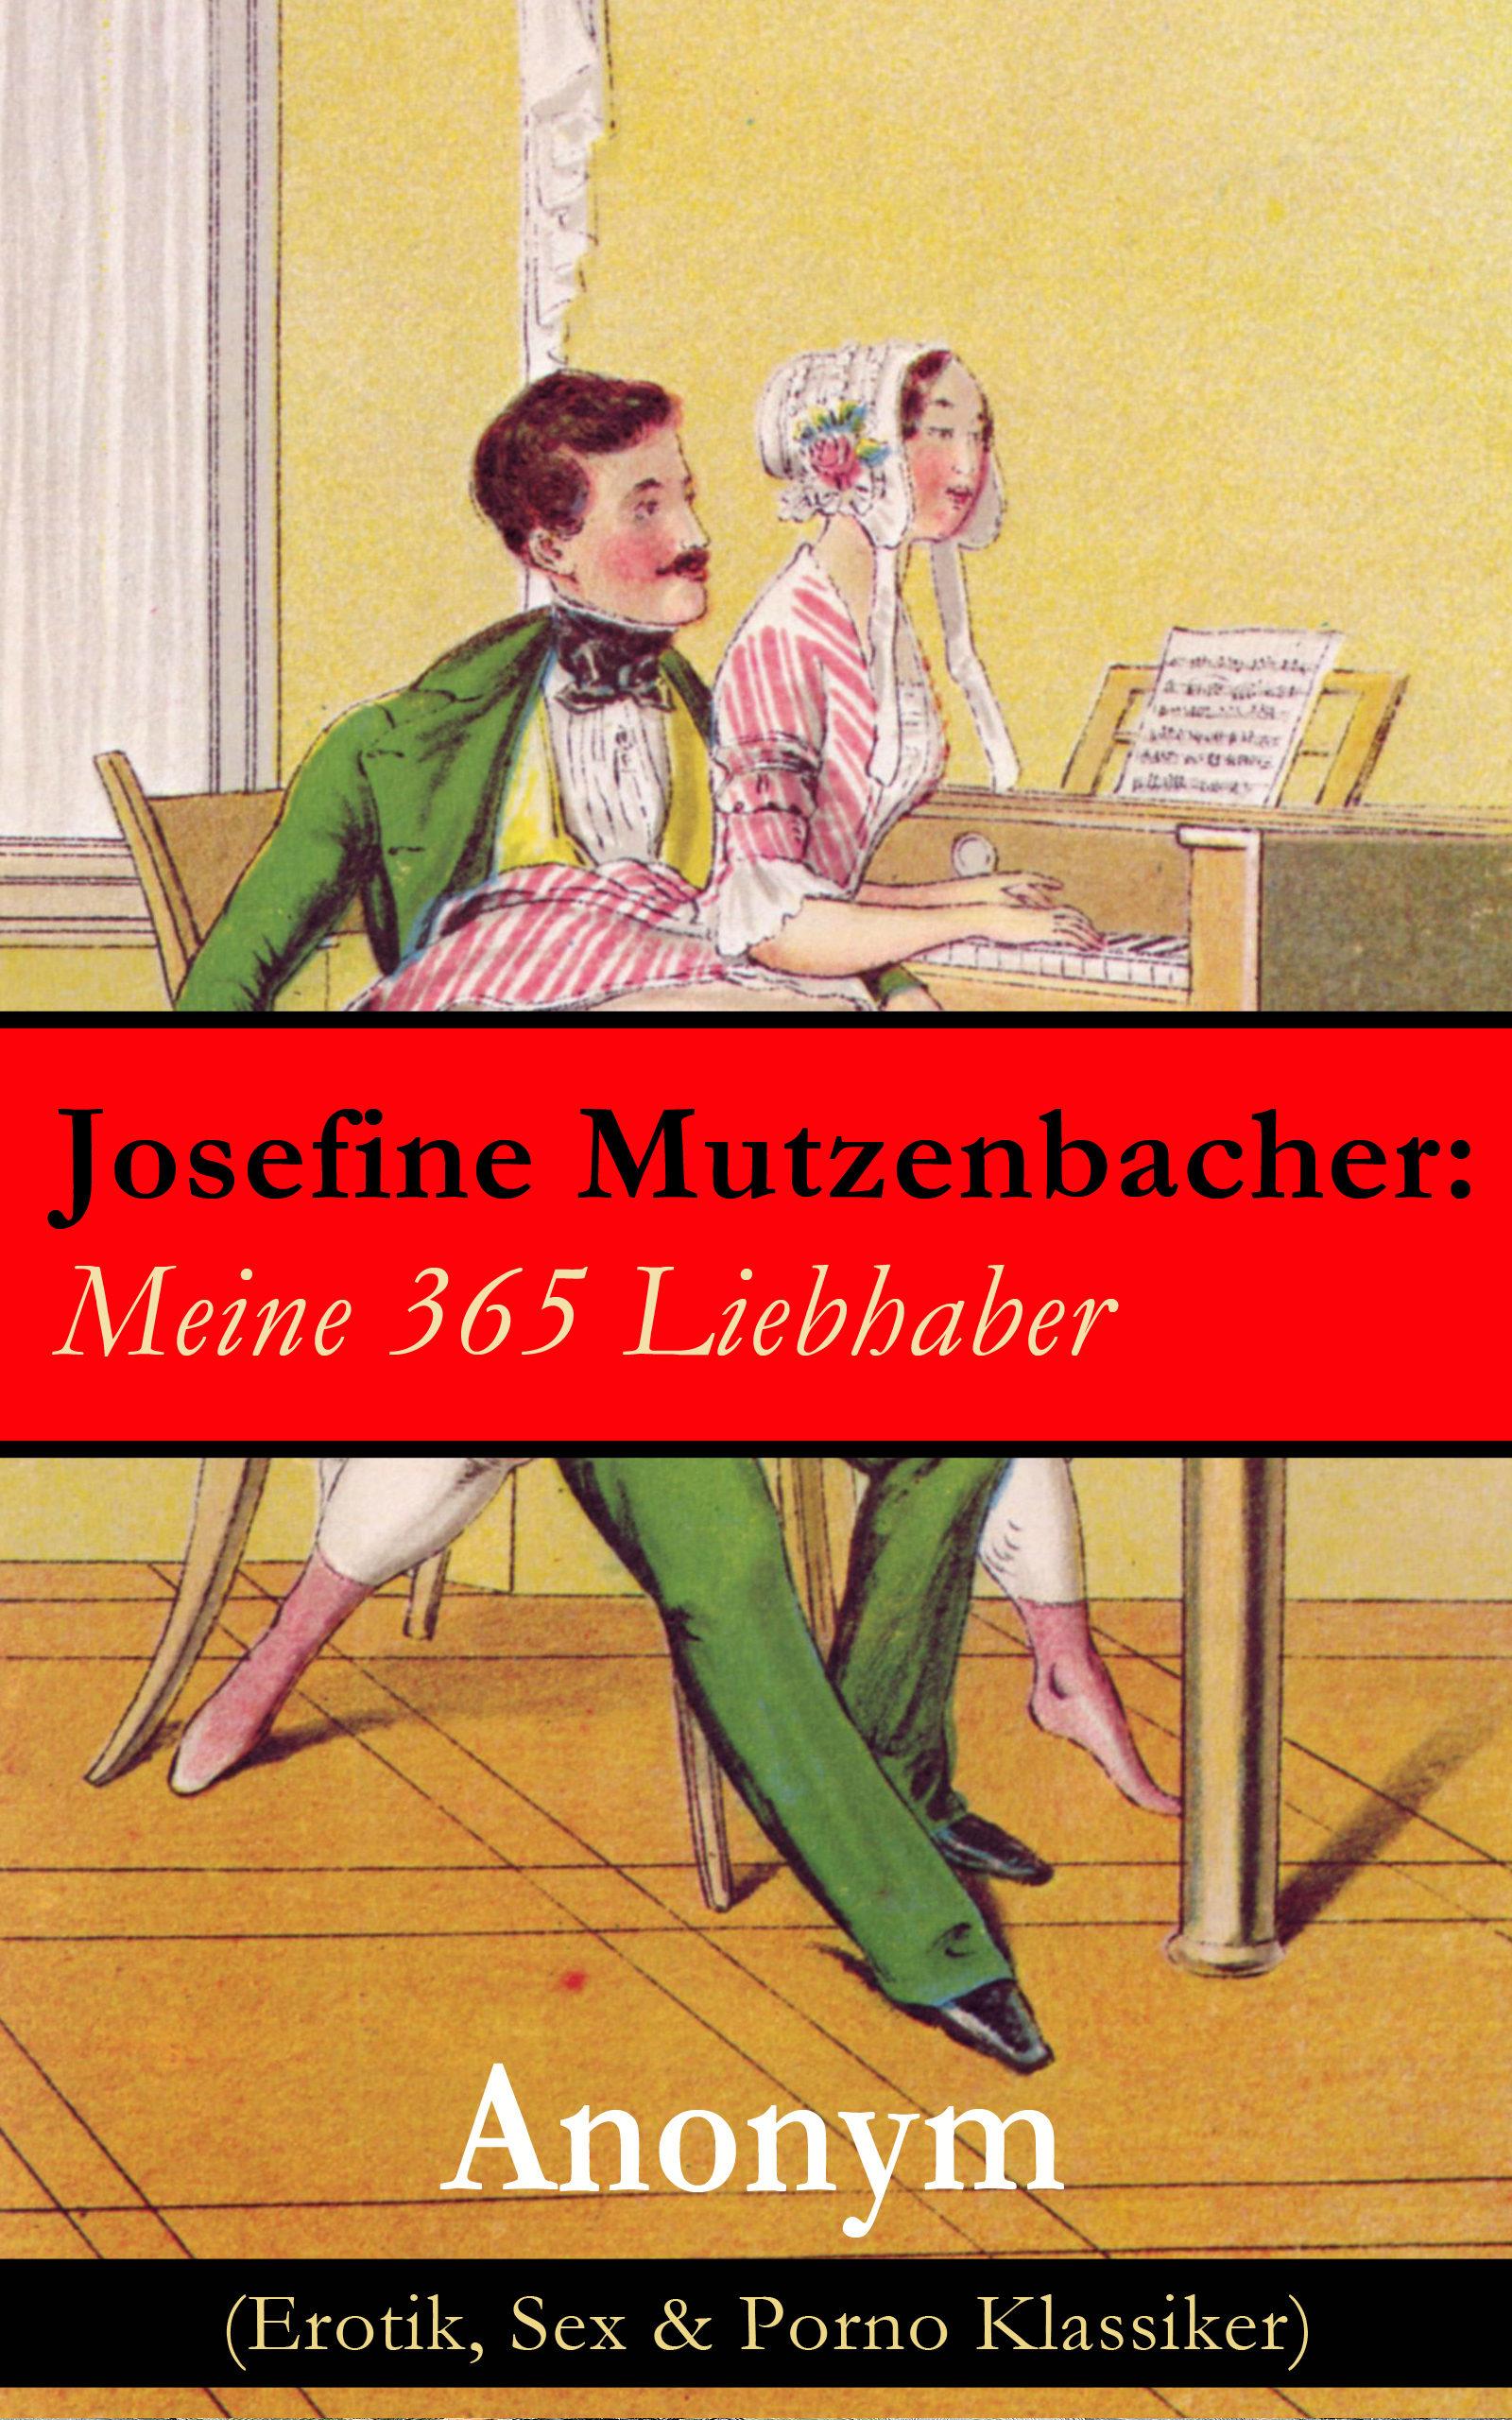 Bateria Musica Porno josefine mutzenbacher: meine 365 liebhaber (erotik, sex & porno klassiker) (ebook)